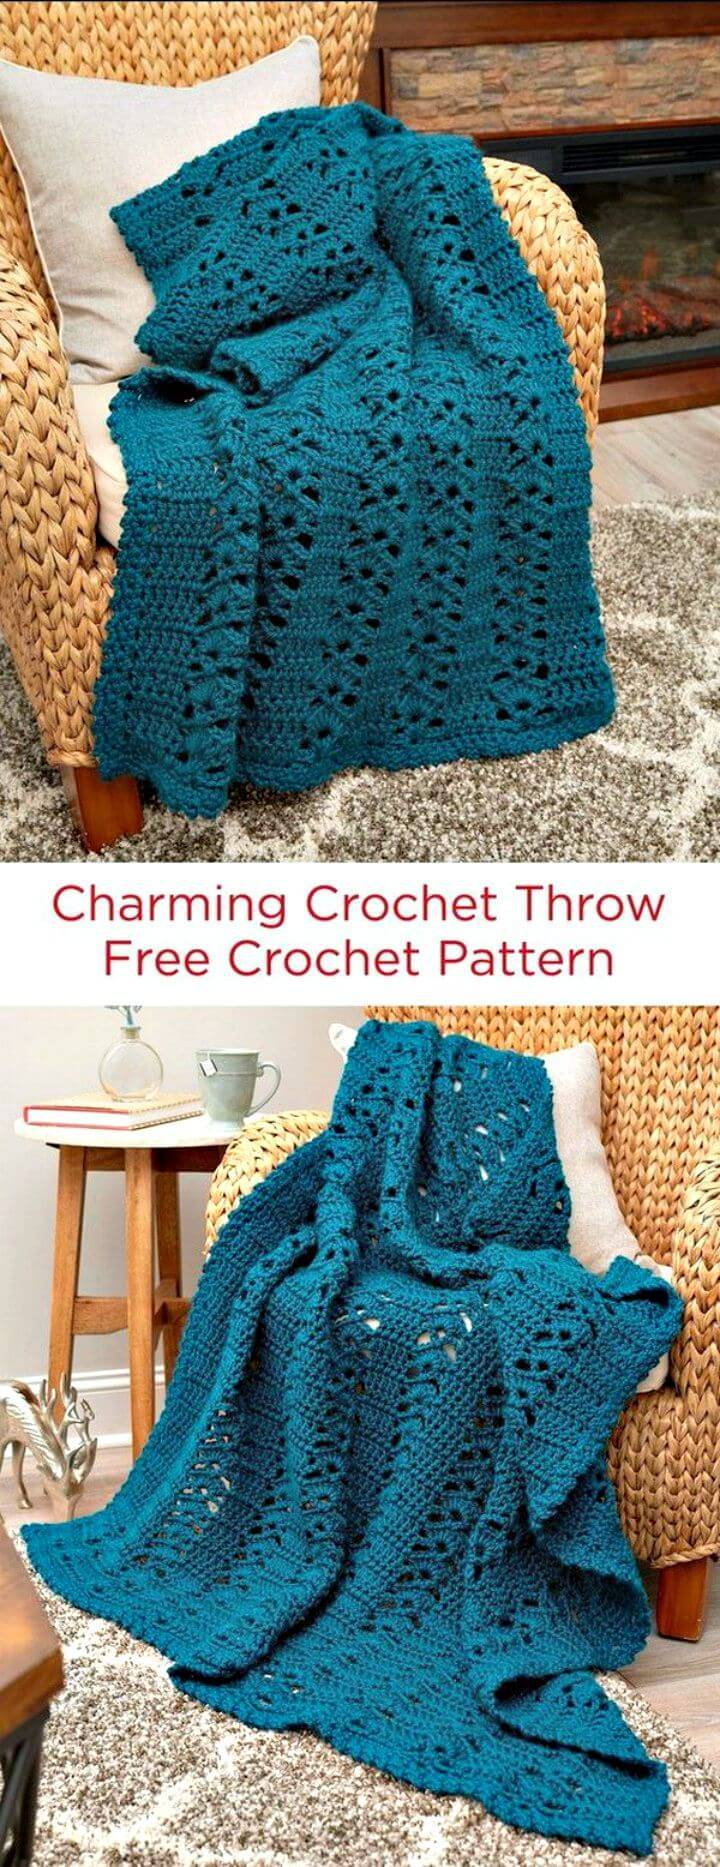 Easy Free Crochet Charming Afghan Throw Blanket Pattern